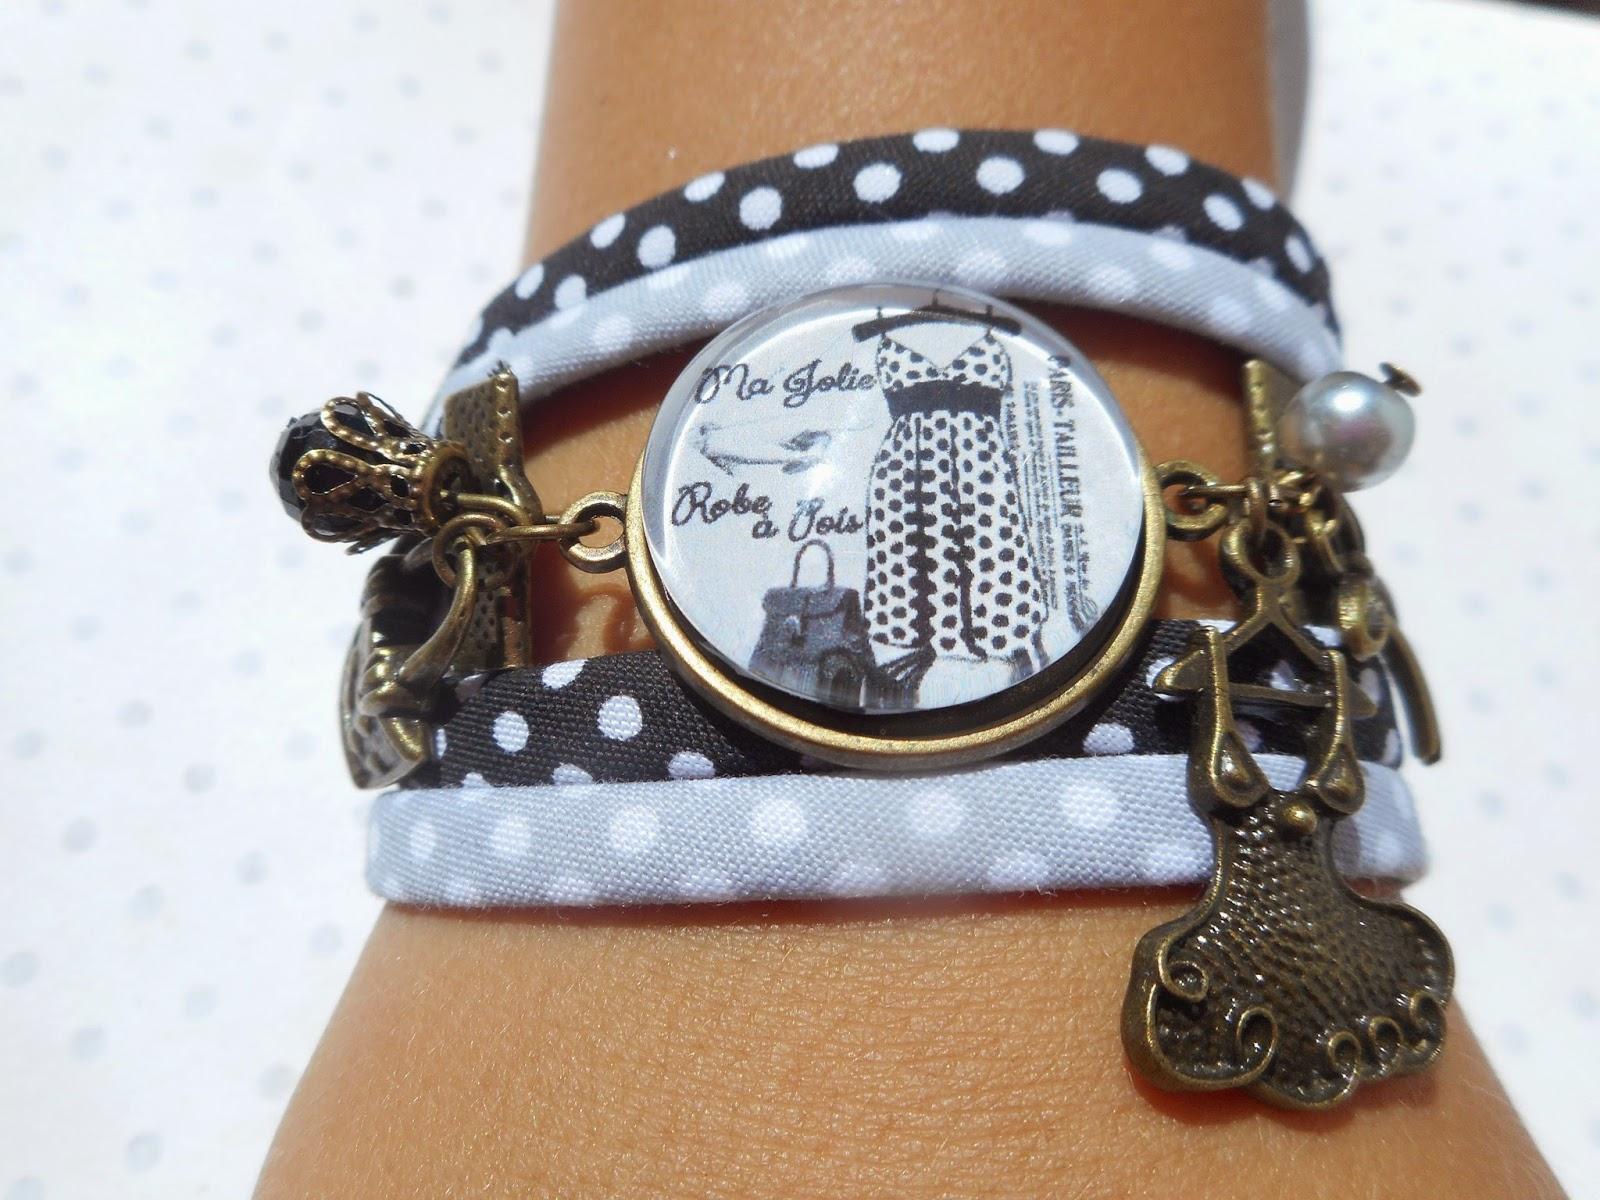 http://www.alittlemarket.com/bracelet/fr_bracelet_multi_rangs_et_cabochon_verre_vintage_ma_jolie_robe_a_pois_-10986289.html